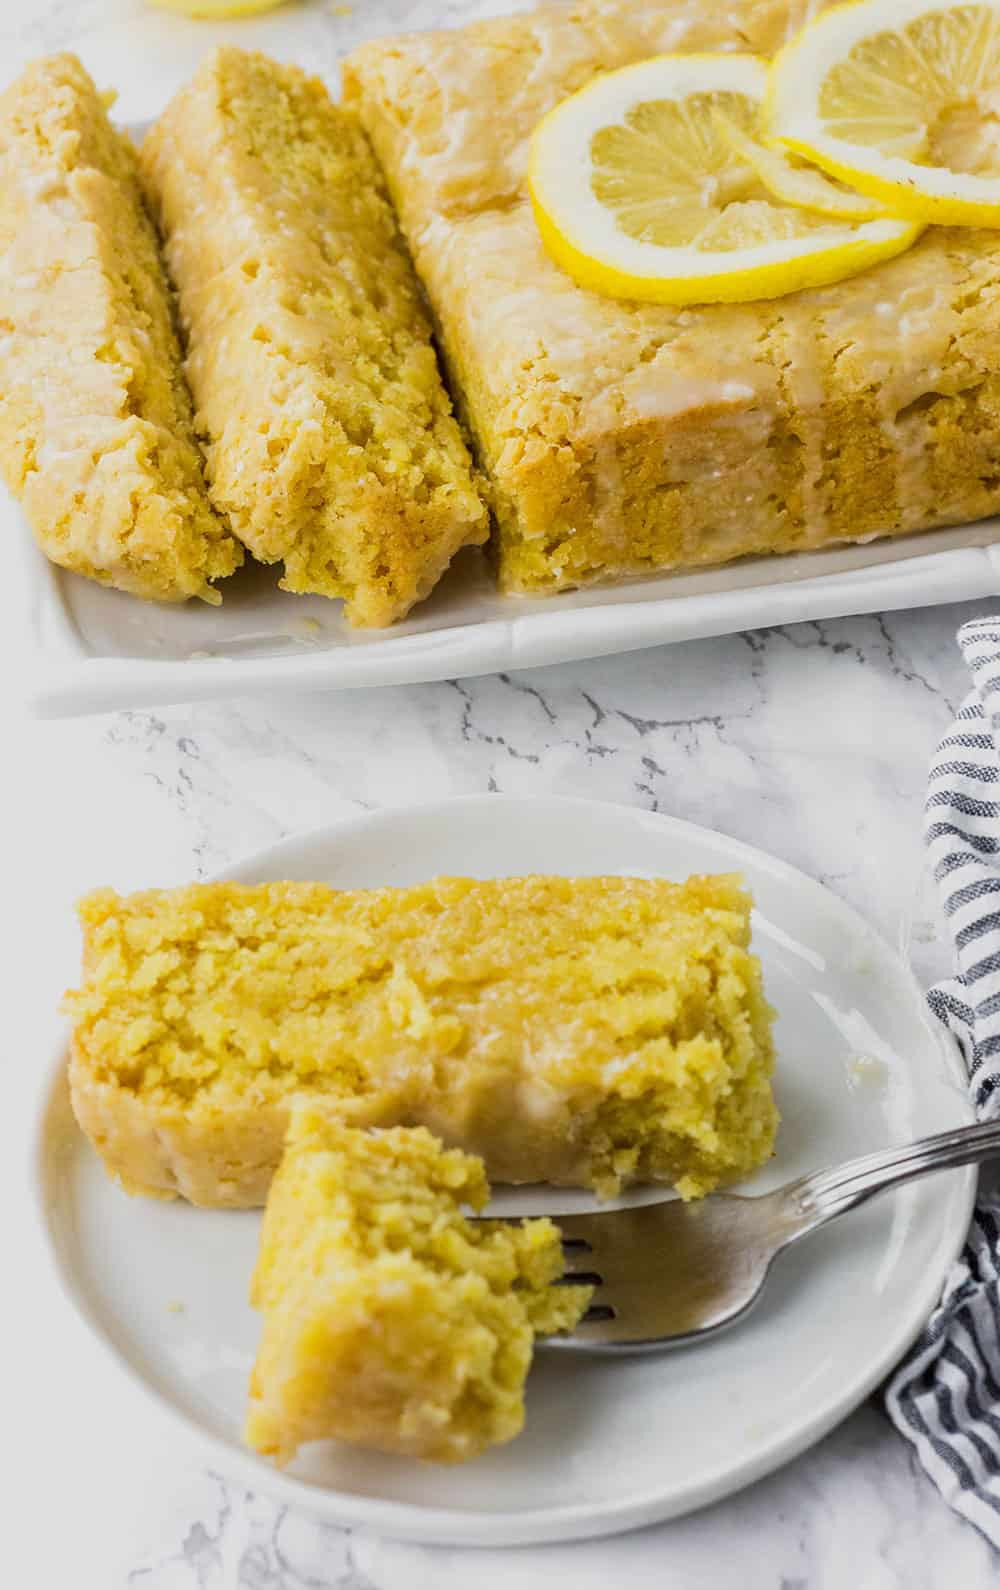 Gluten-Free Vegan Lemon Pound Cake